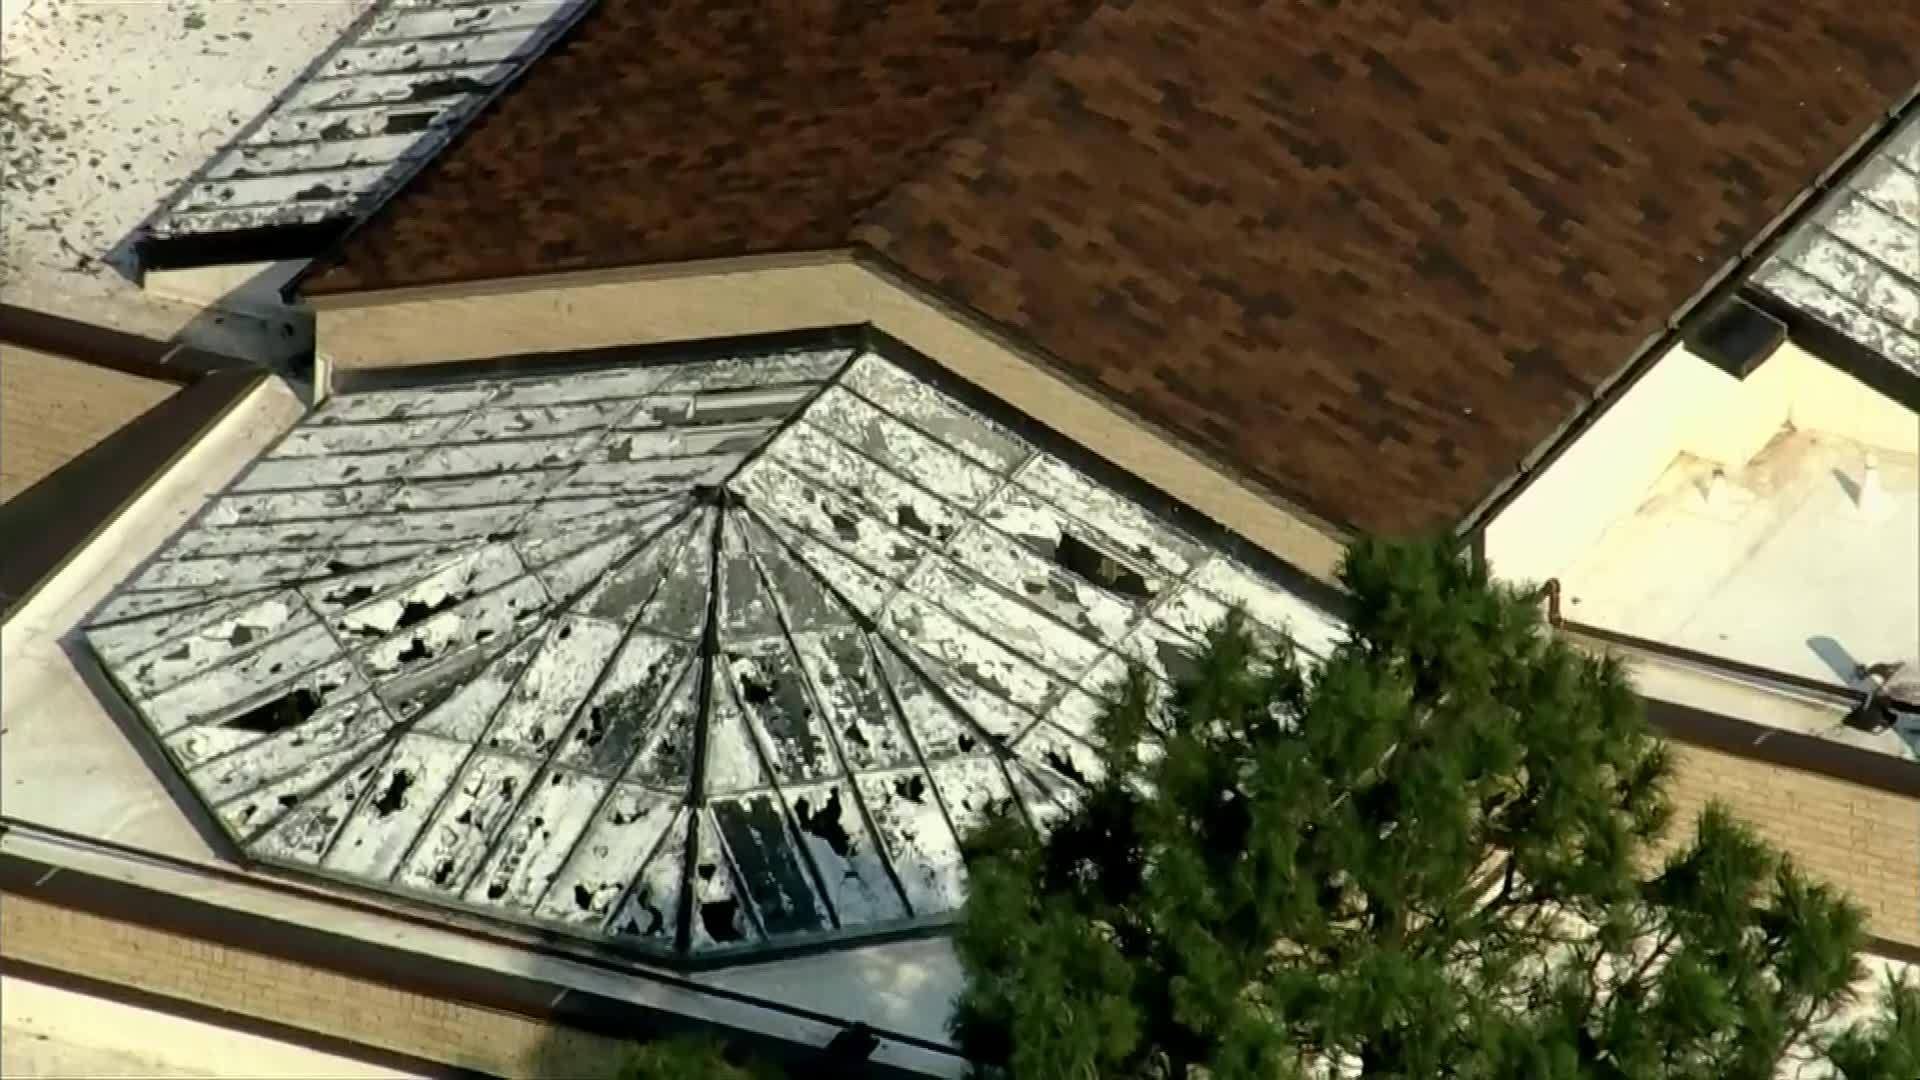 Colorado zoo closed after hail storm injures 5, kills birds